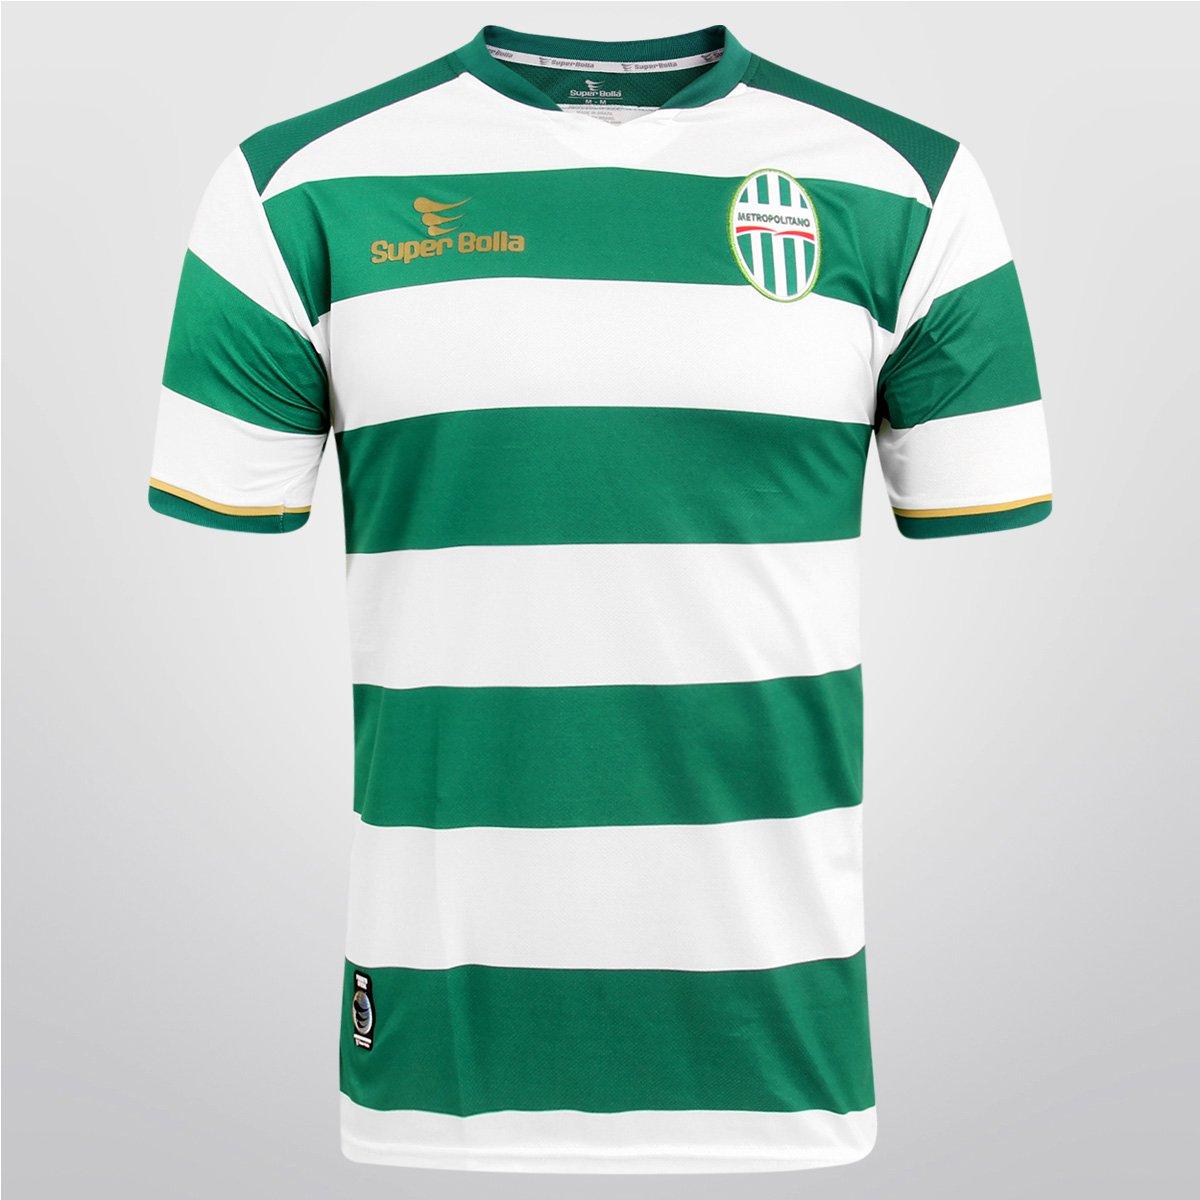 6ed7bf369d Camisa Super Bolla Metropolitano III 2015 nº 10 - Jogador - Compre Agora